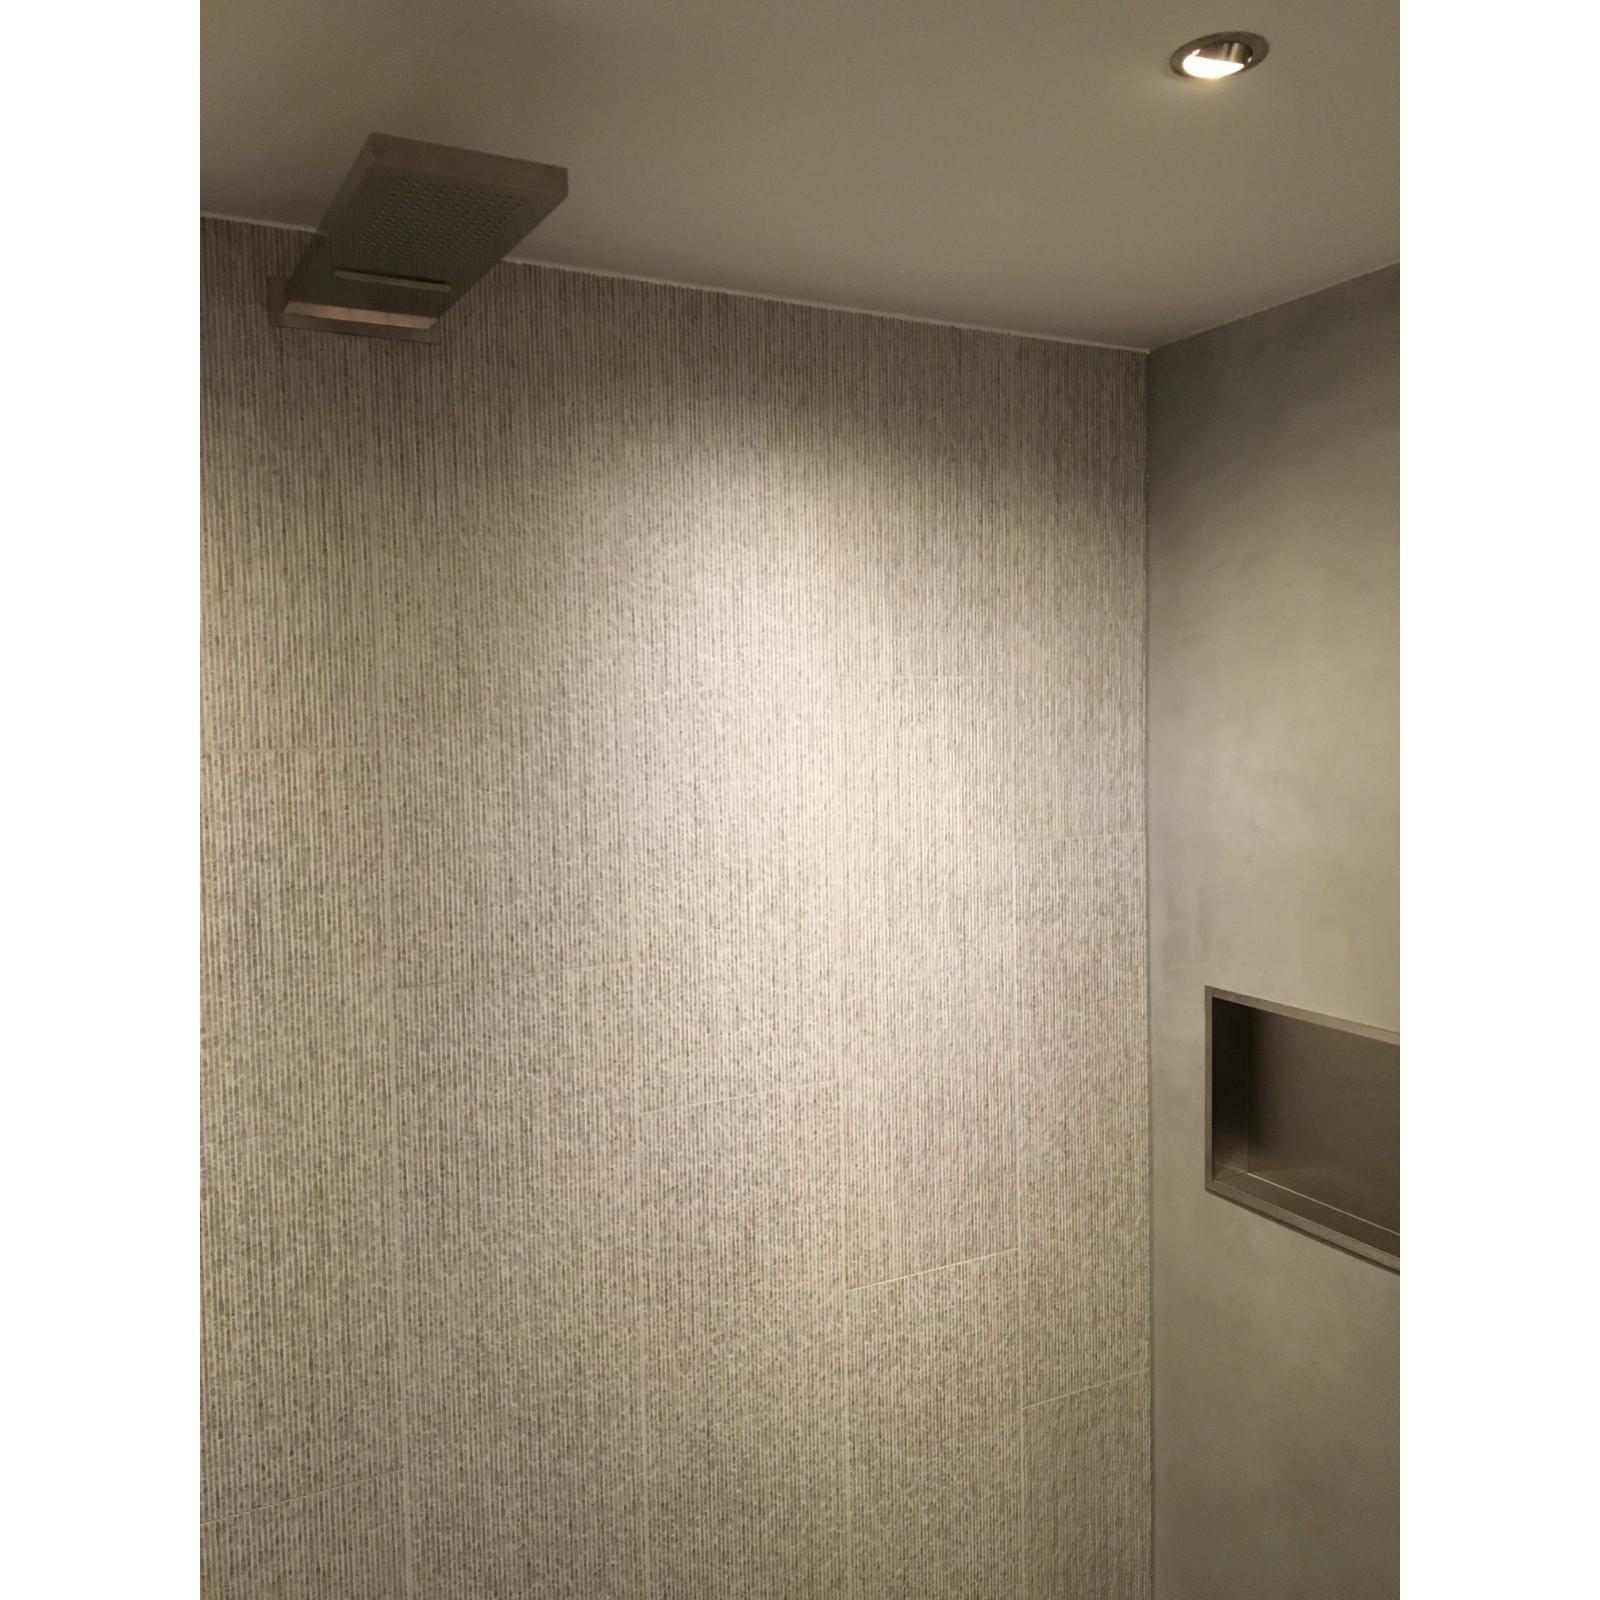 badkamer verbouwing, renovatie, amsterdam, tuijps, beton cire, porcelanosa, la fabricca, verlaagd plafond, stucen, led spotjes